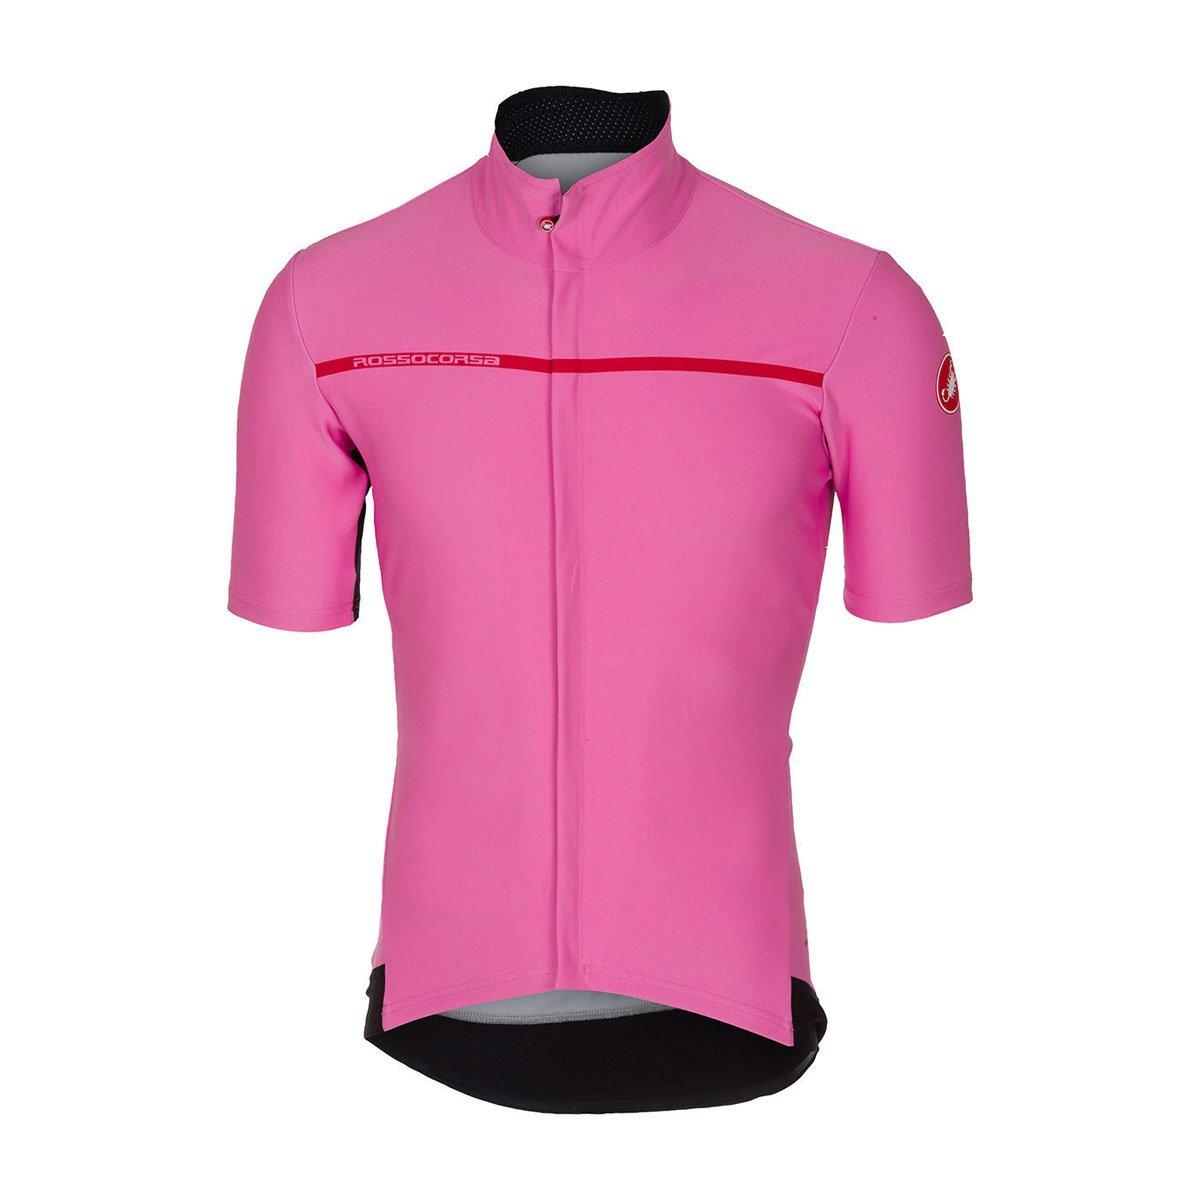 CastelliメンズGabba 3半袖サイクリングjacketb17084 B076ZSX6F6 Large Giro Pink Giro Pink Large